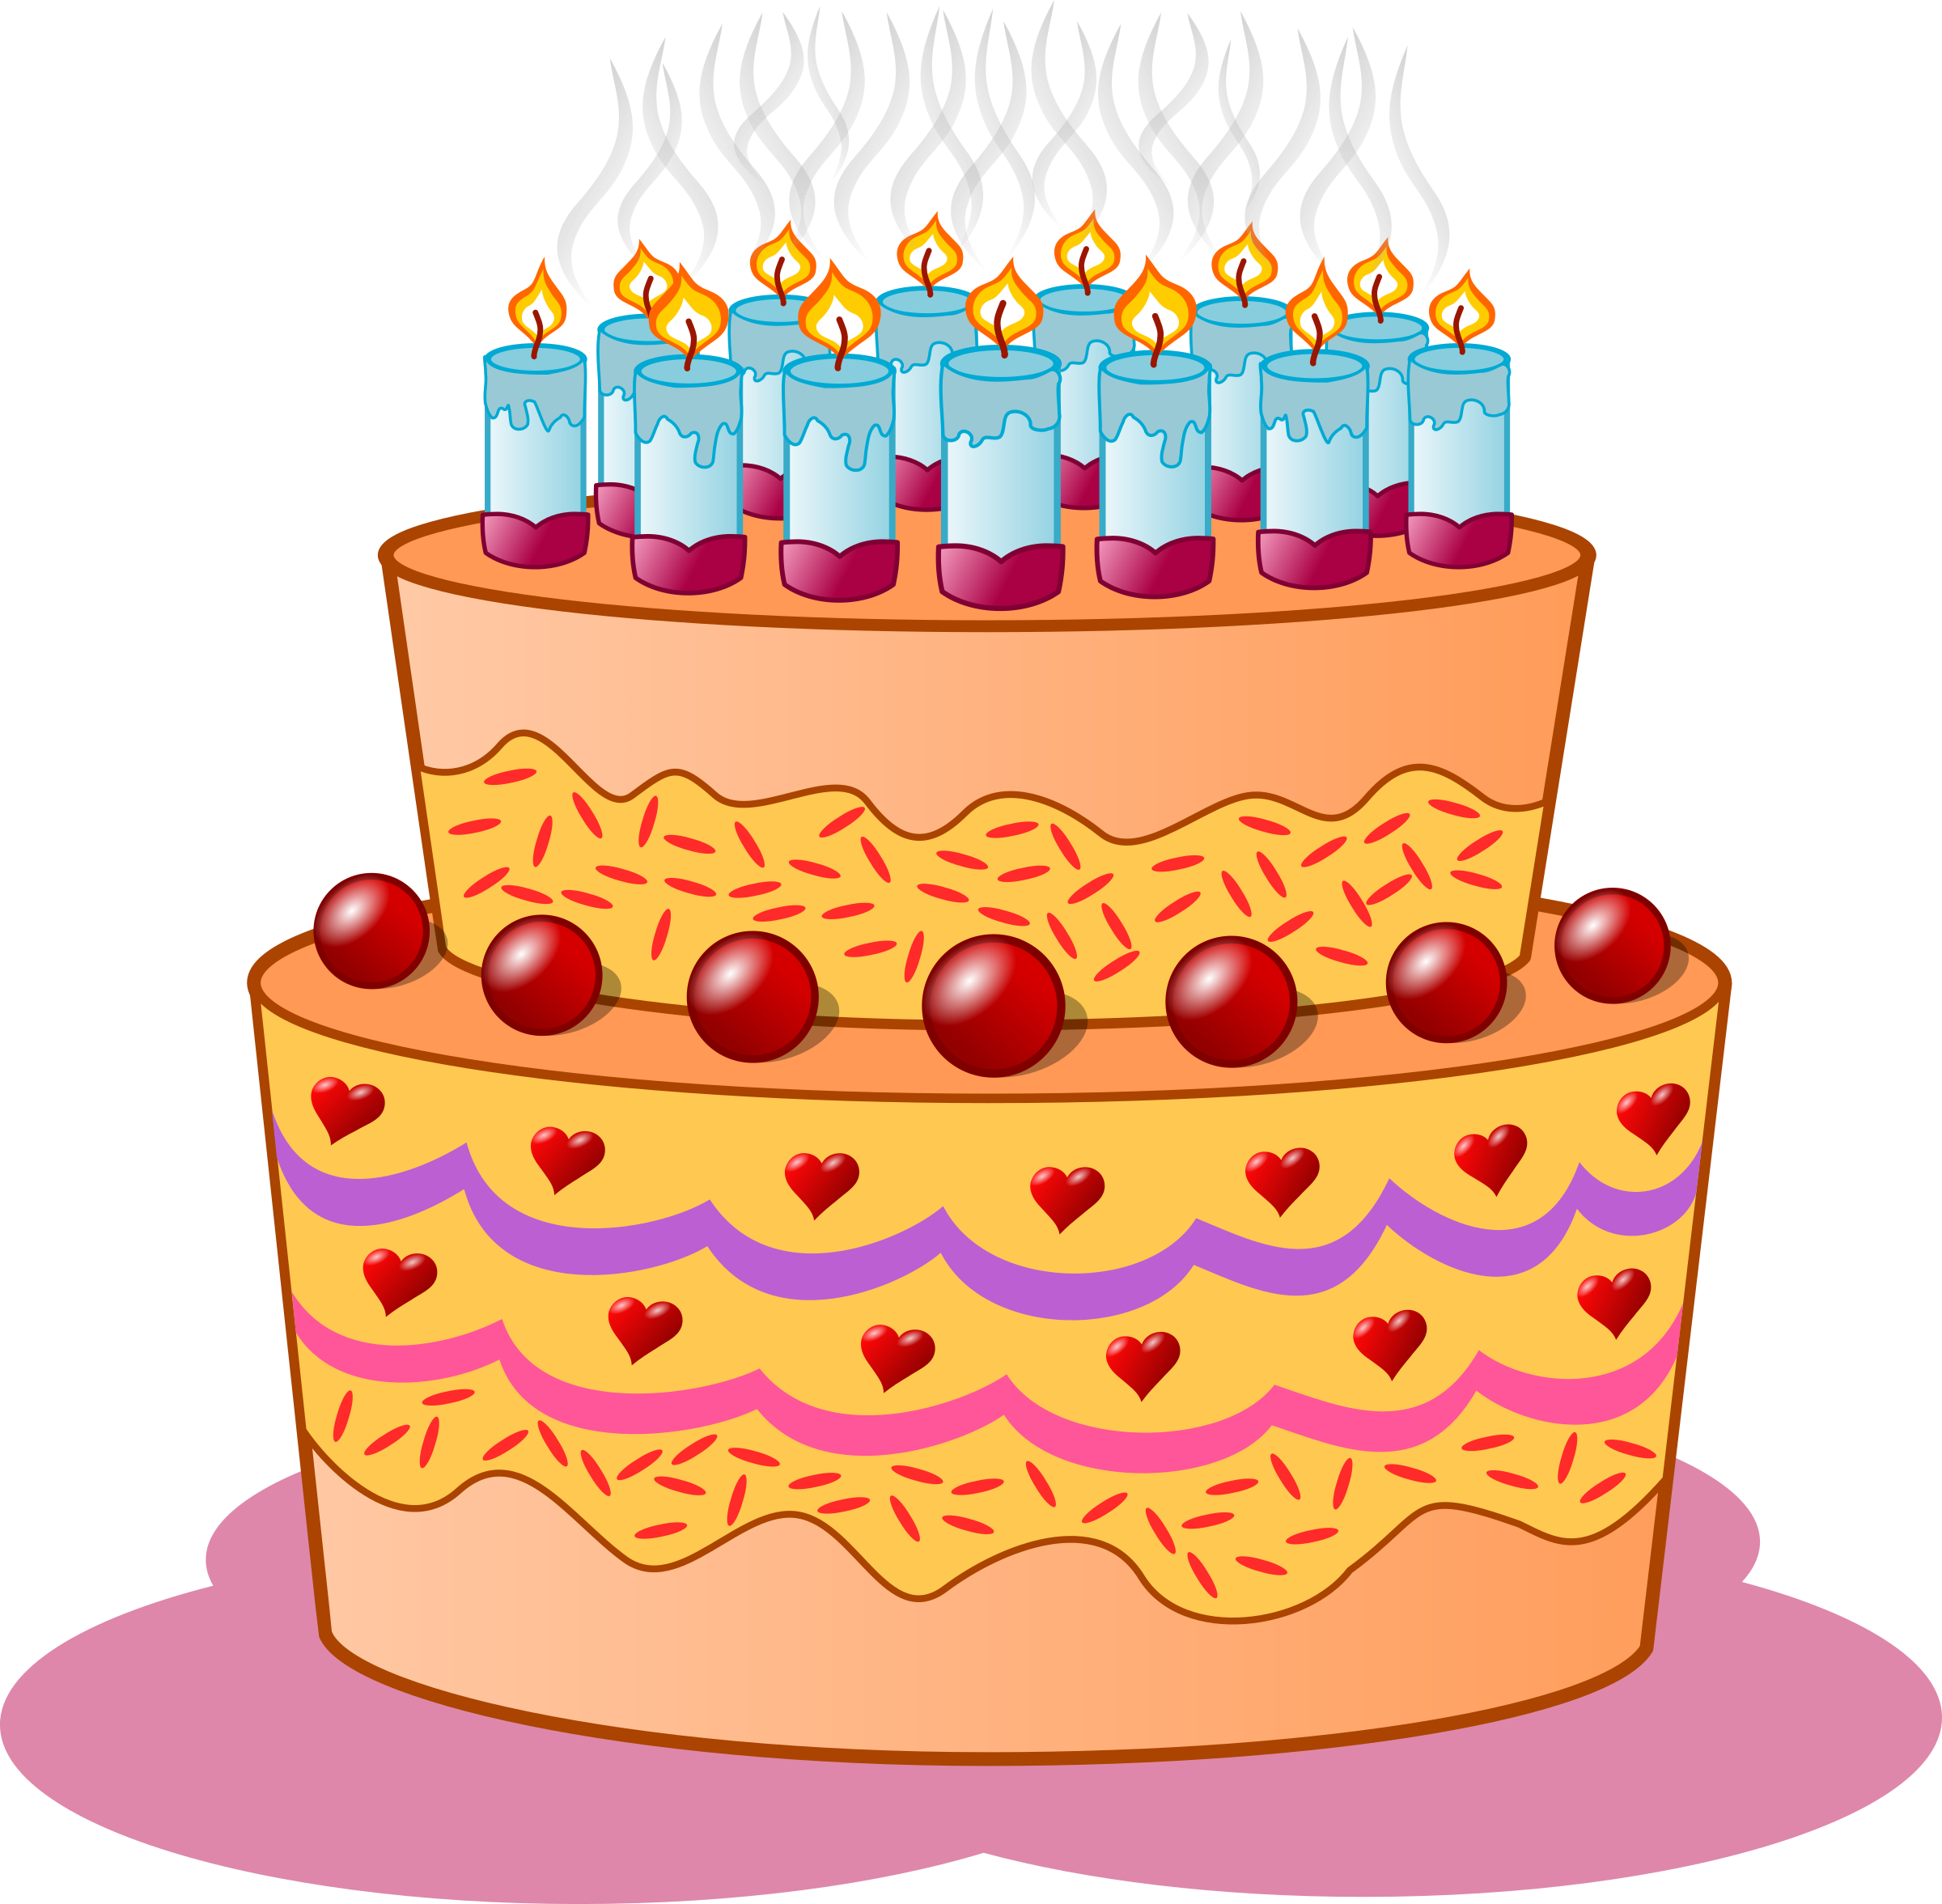 Clipart cake birthday jpg transparent Clipart - Birthday cake jpg transparent